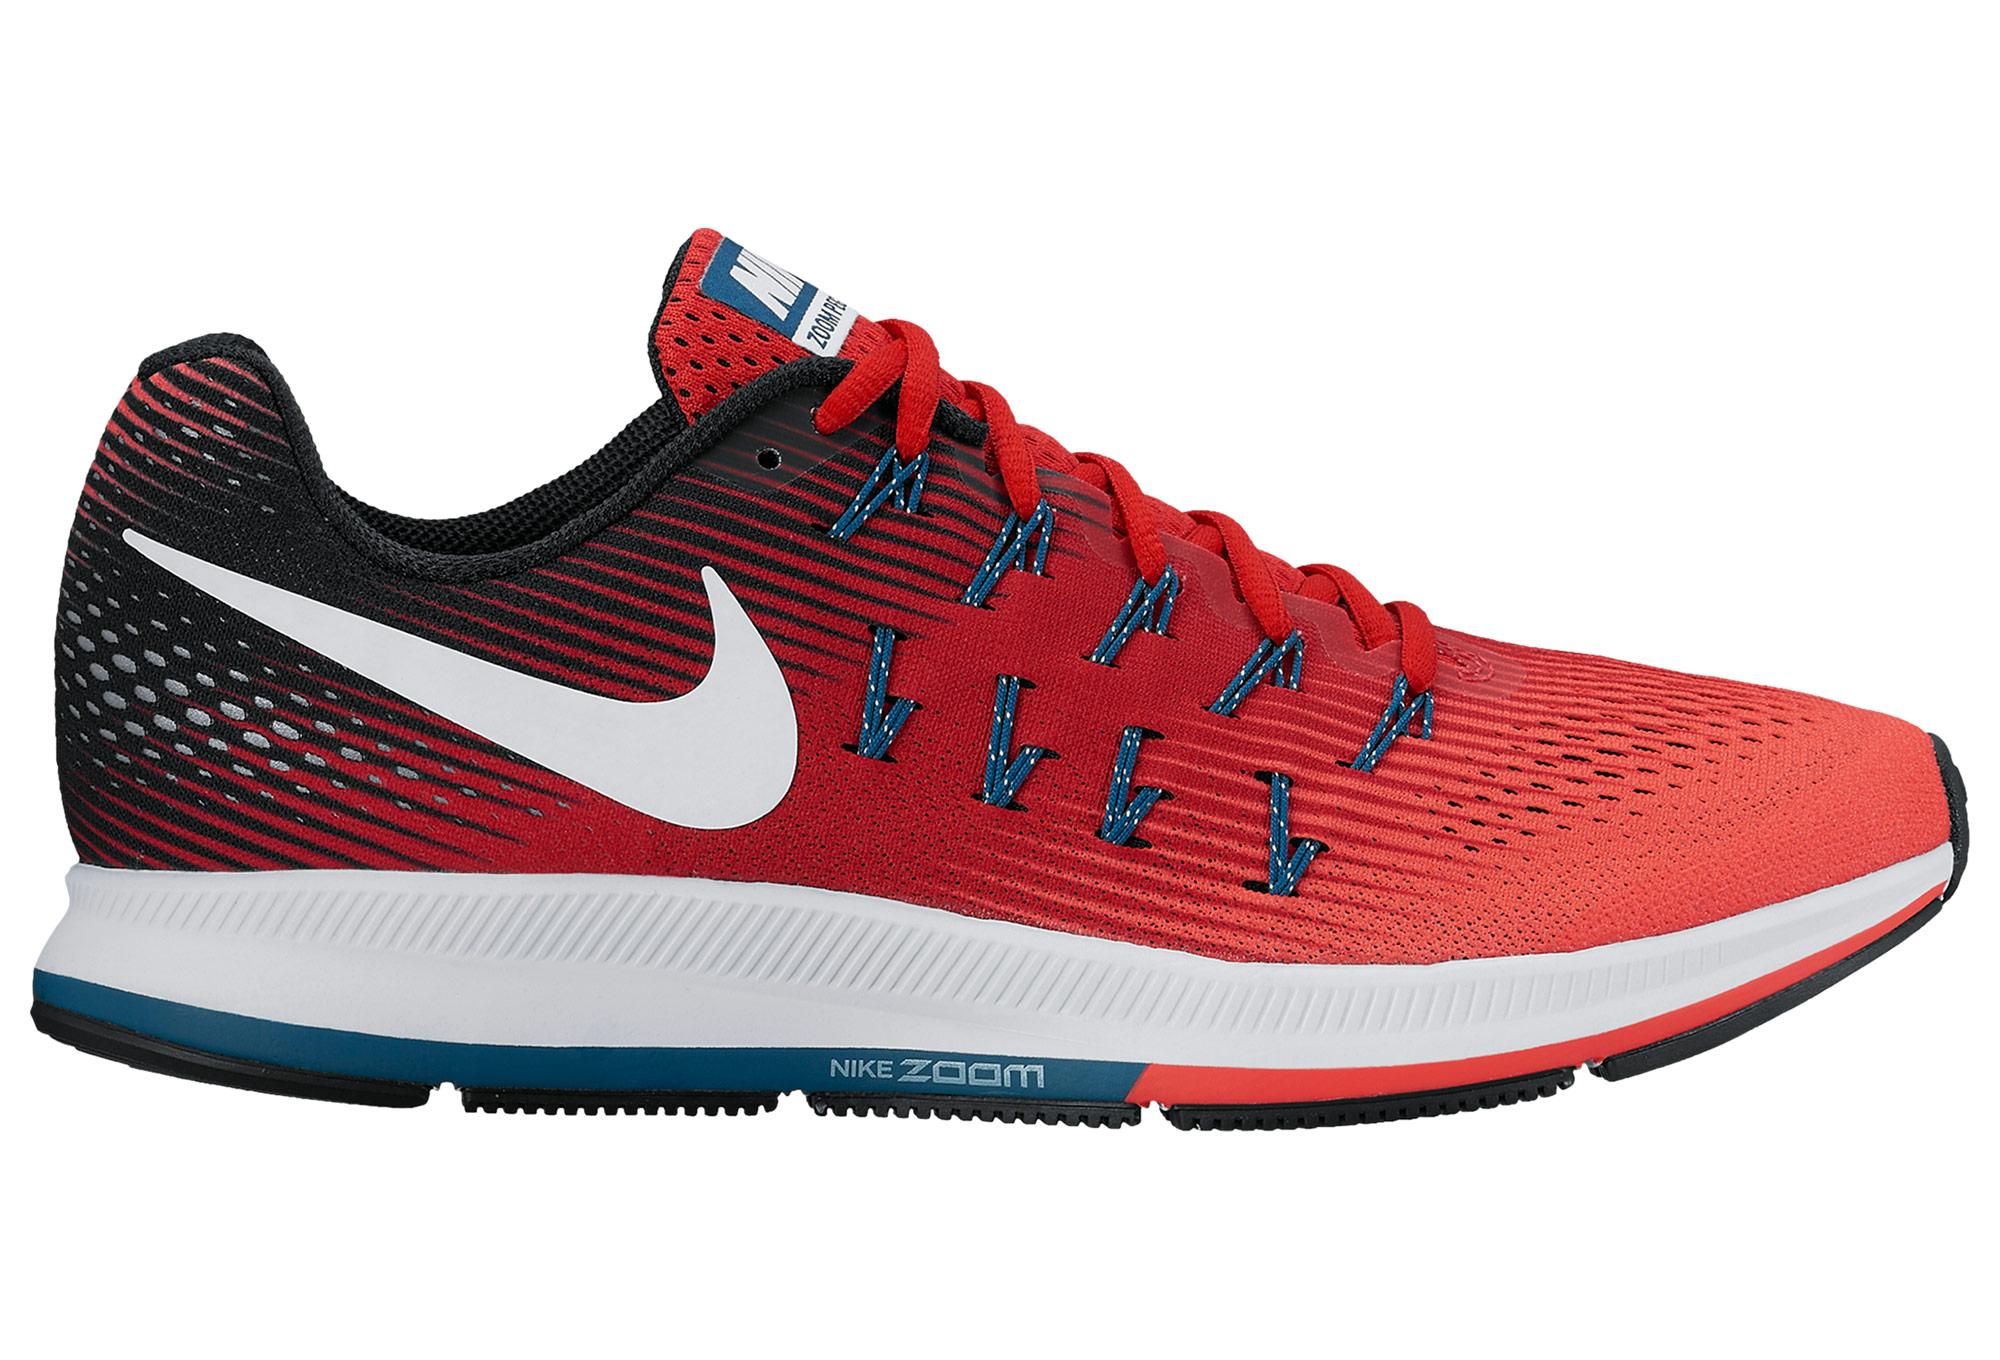 new product fe5b1 c0bdc Chaussures de Running Nike Air Zoom Pegasus 33 Rouge   Noir